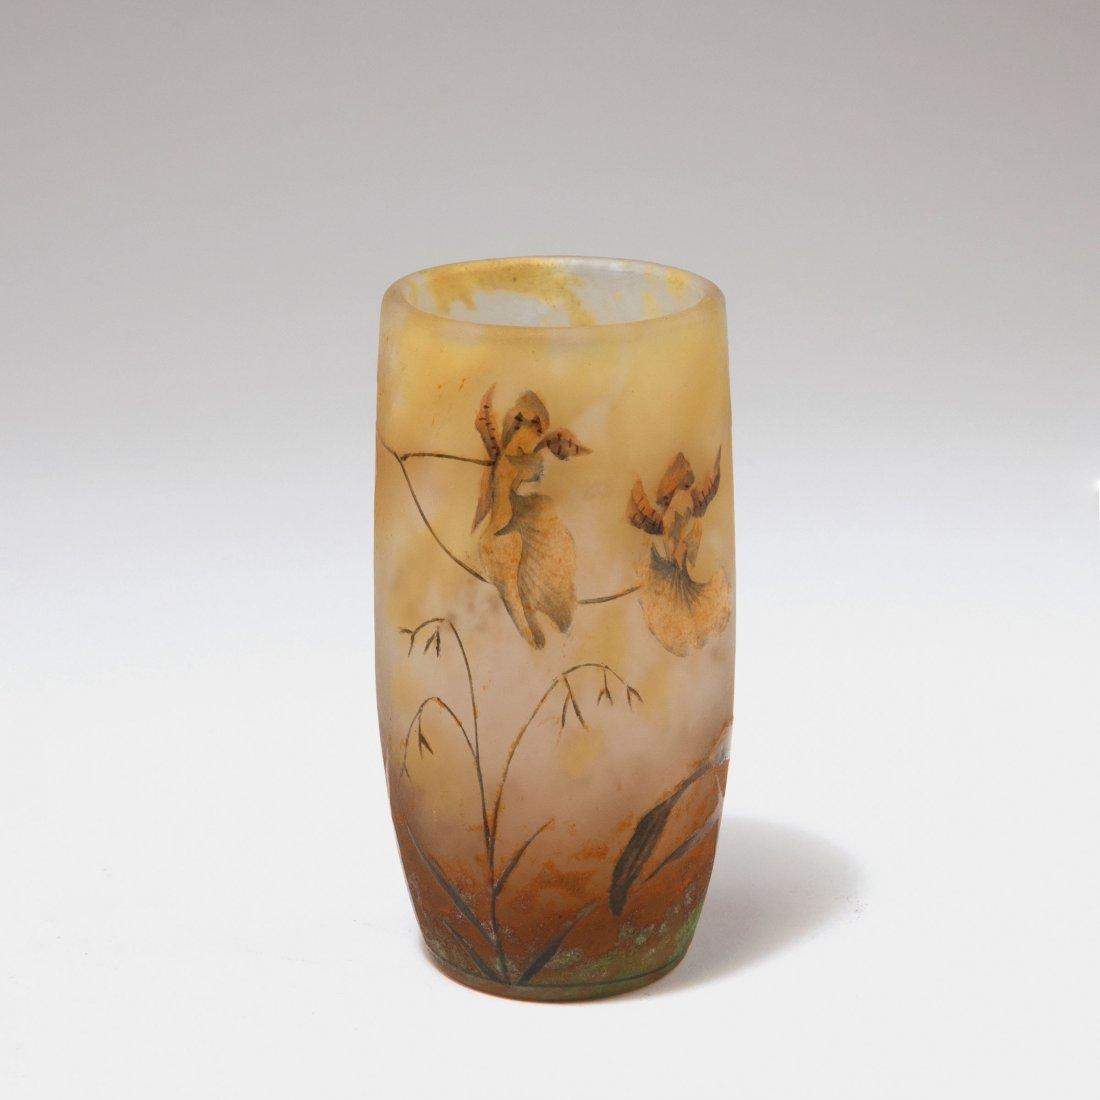 'Orchidees' vase, 1905-10